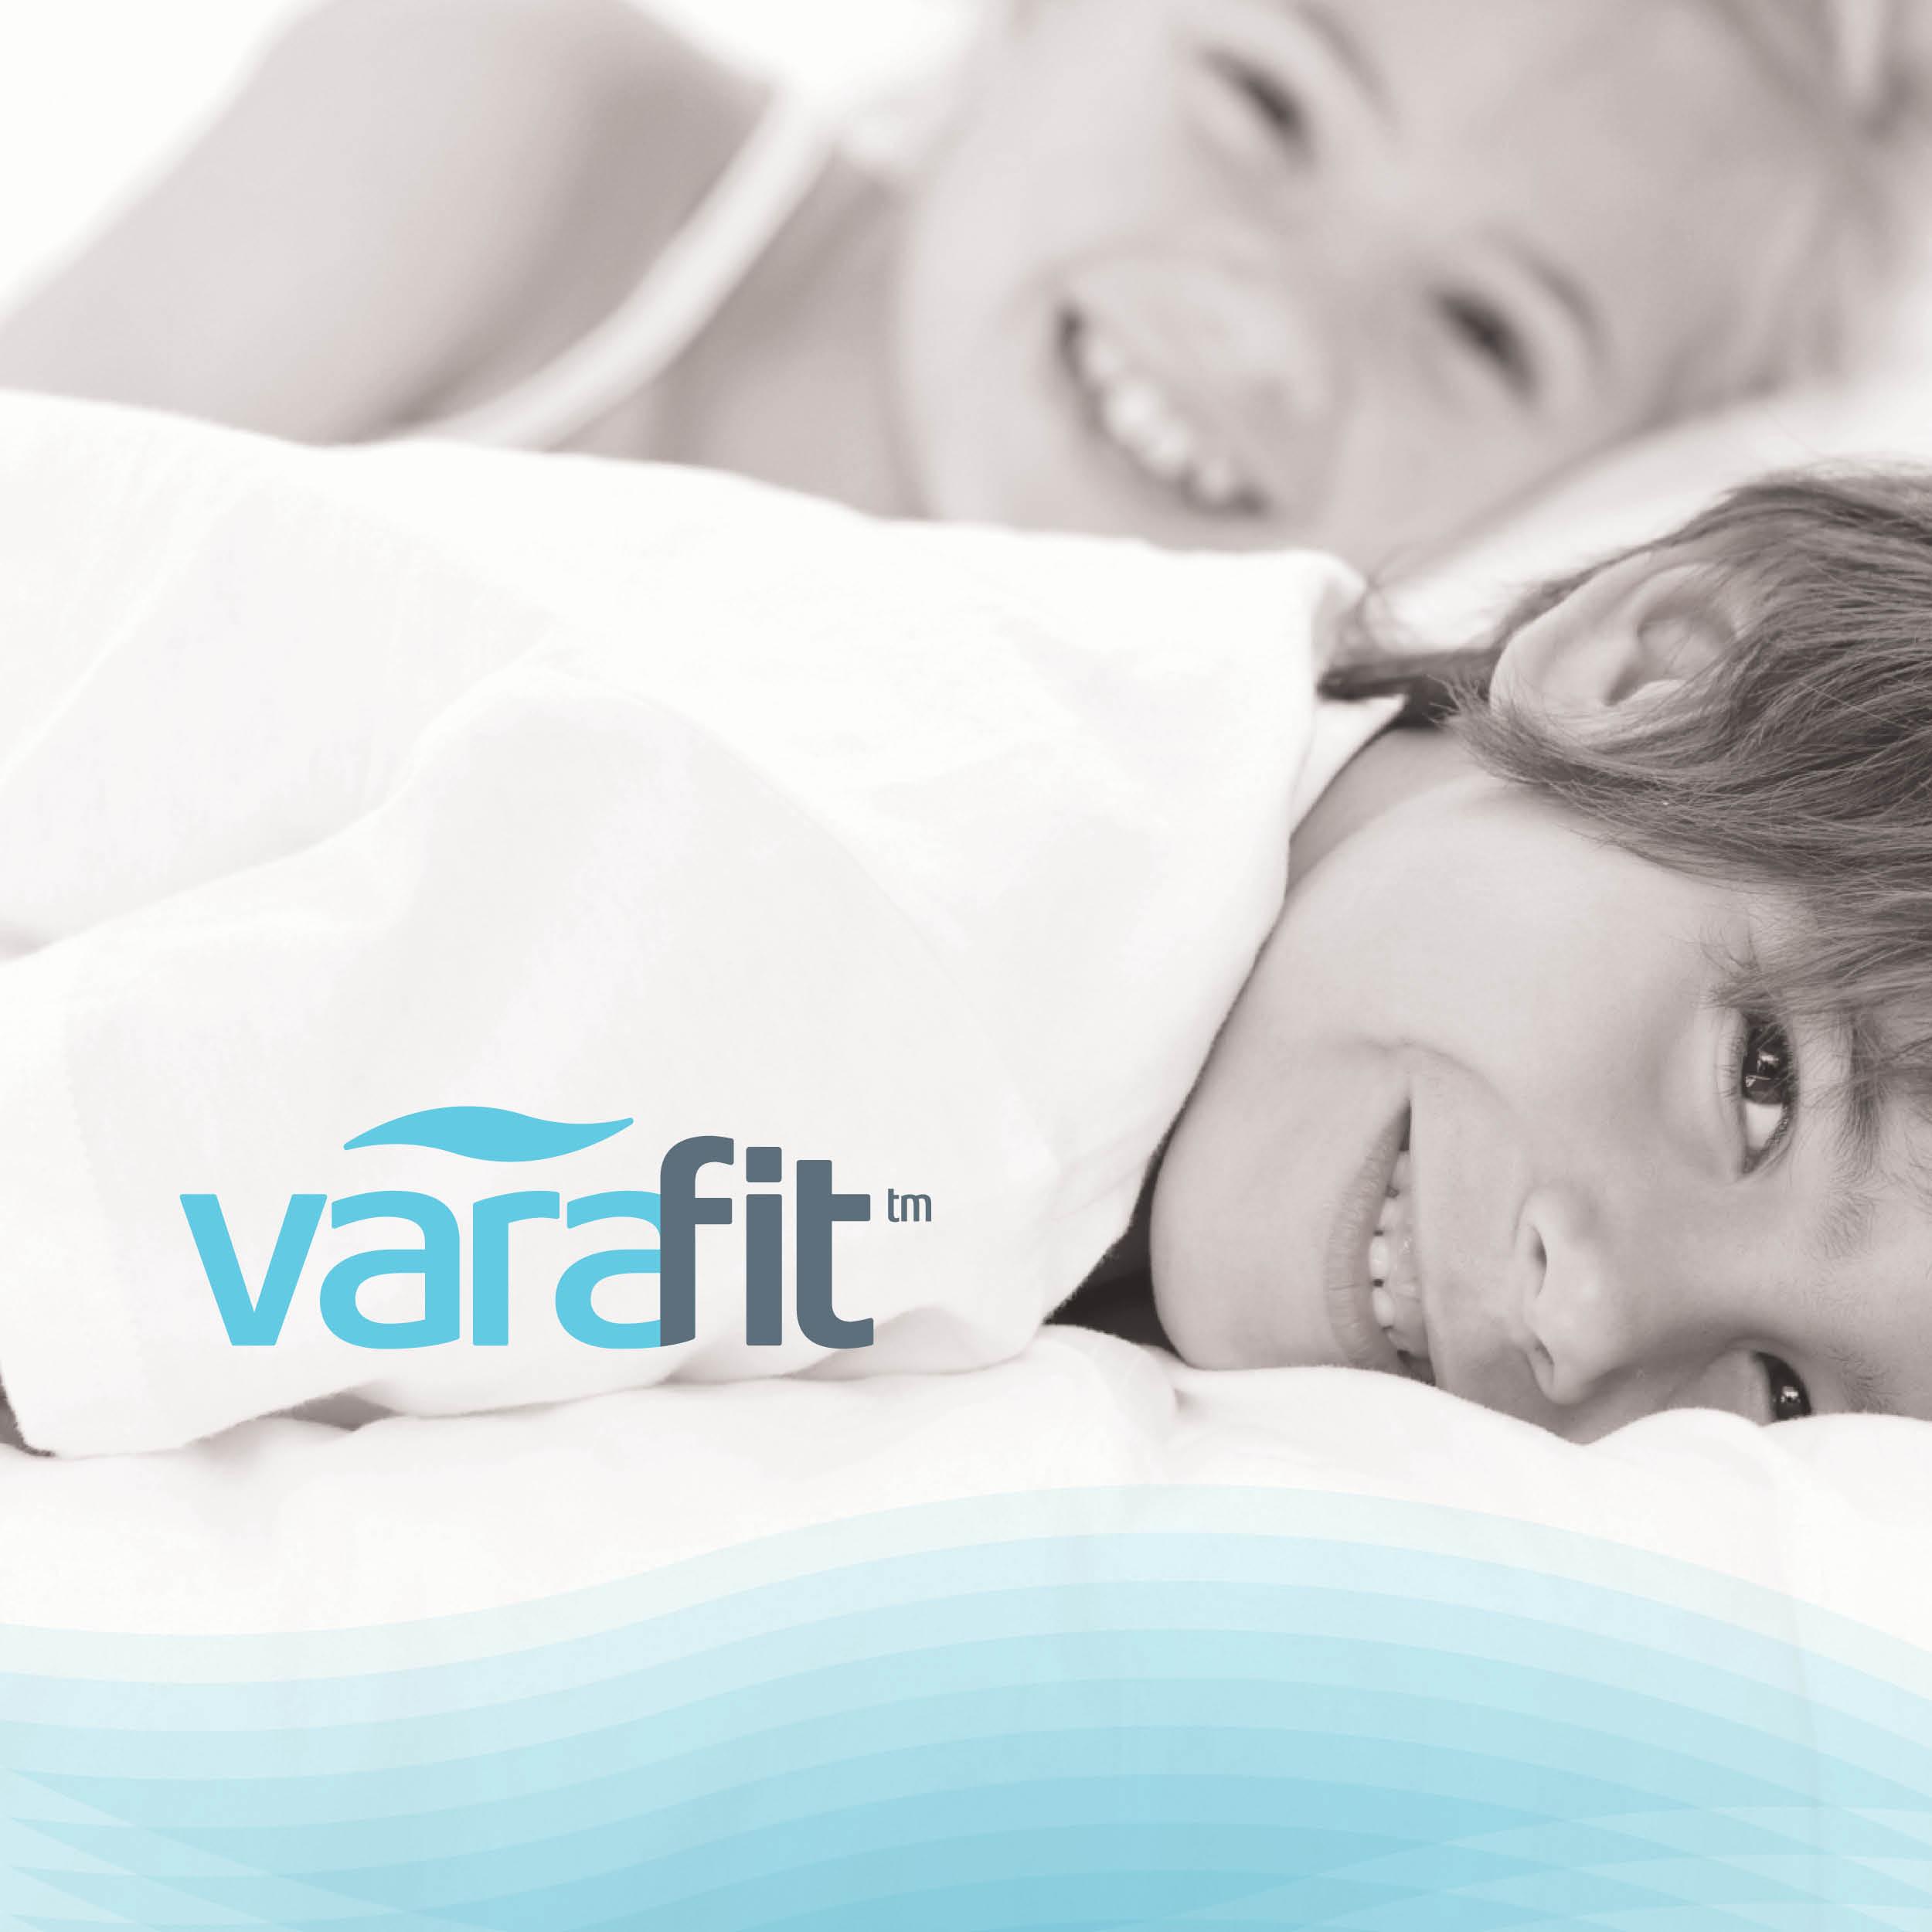 Varafit_002